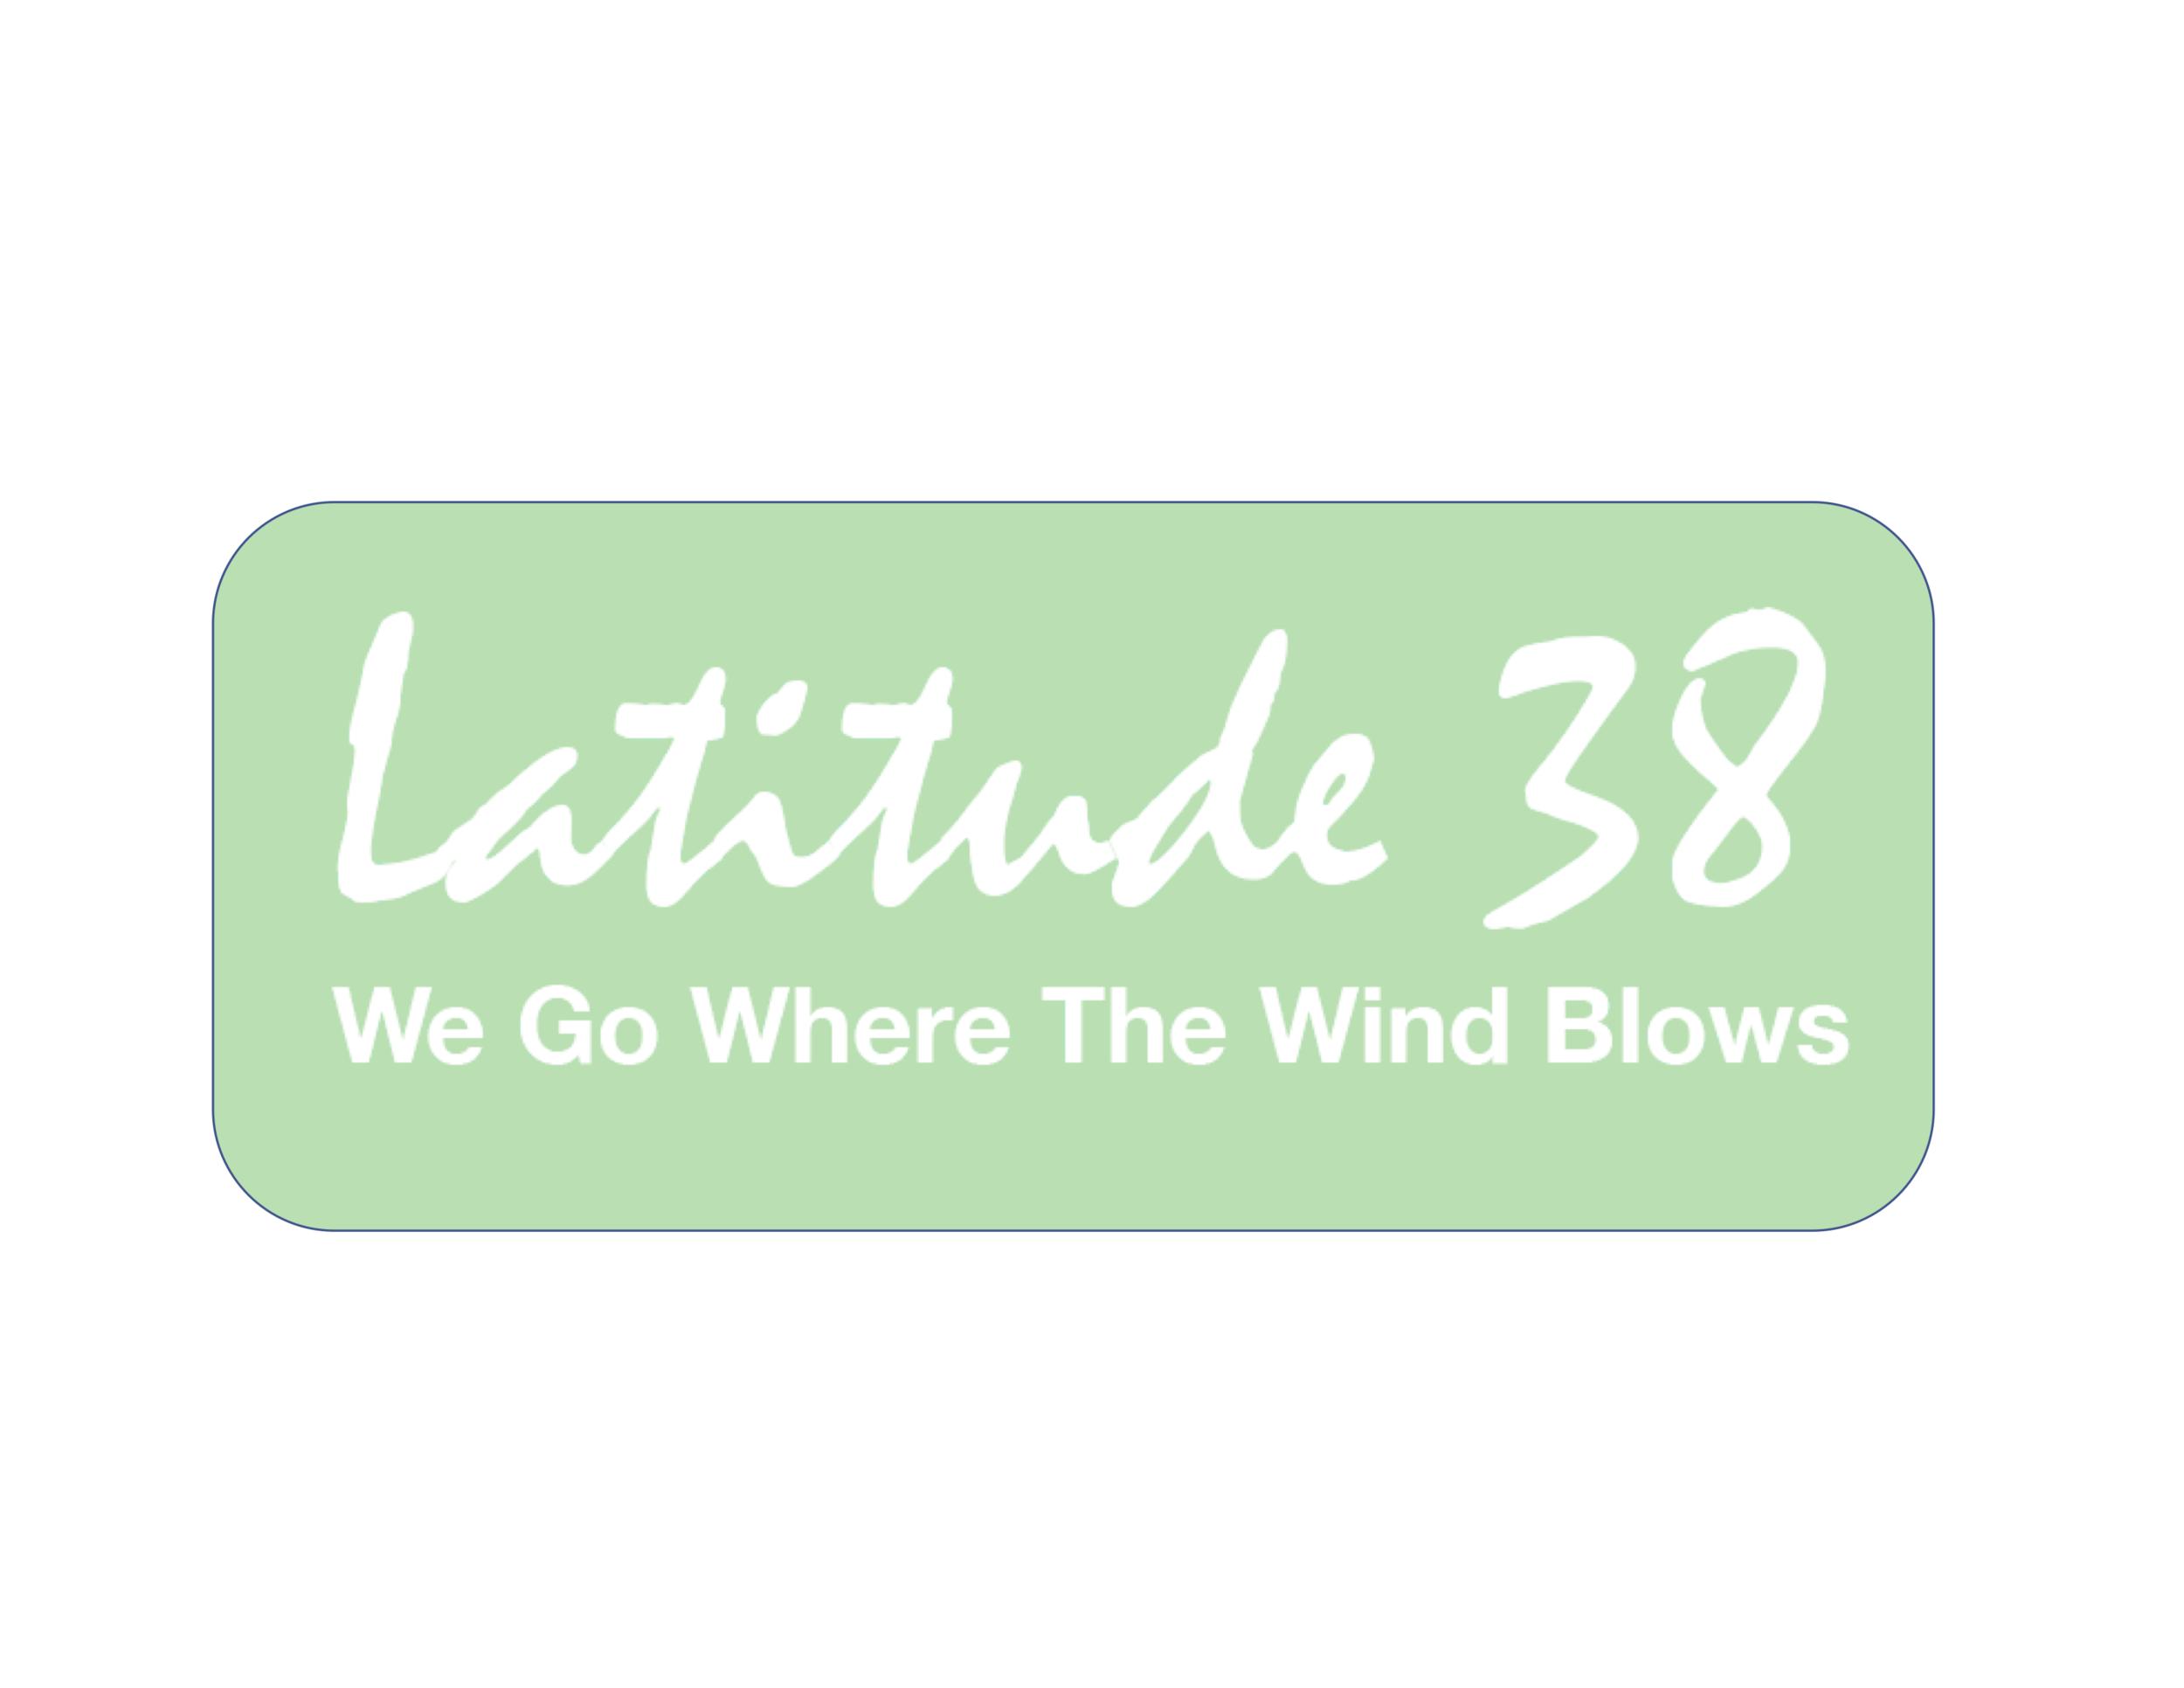 https://www.latitude38.com/